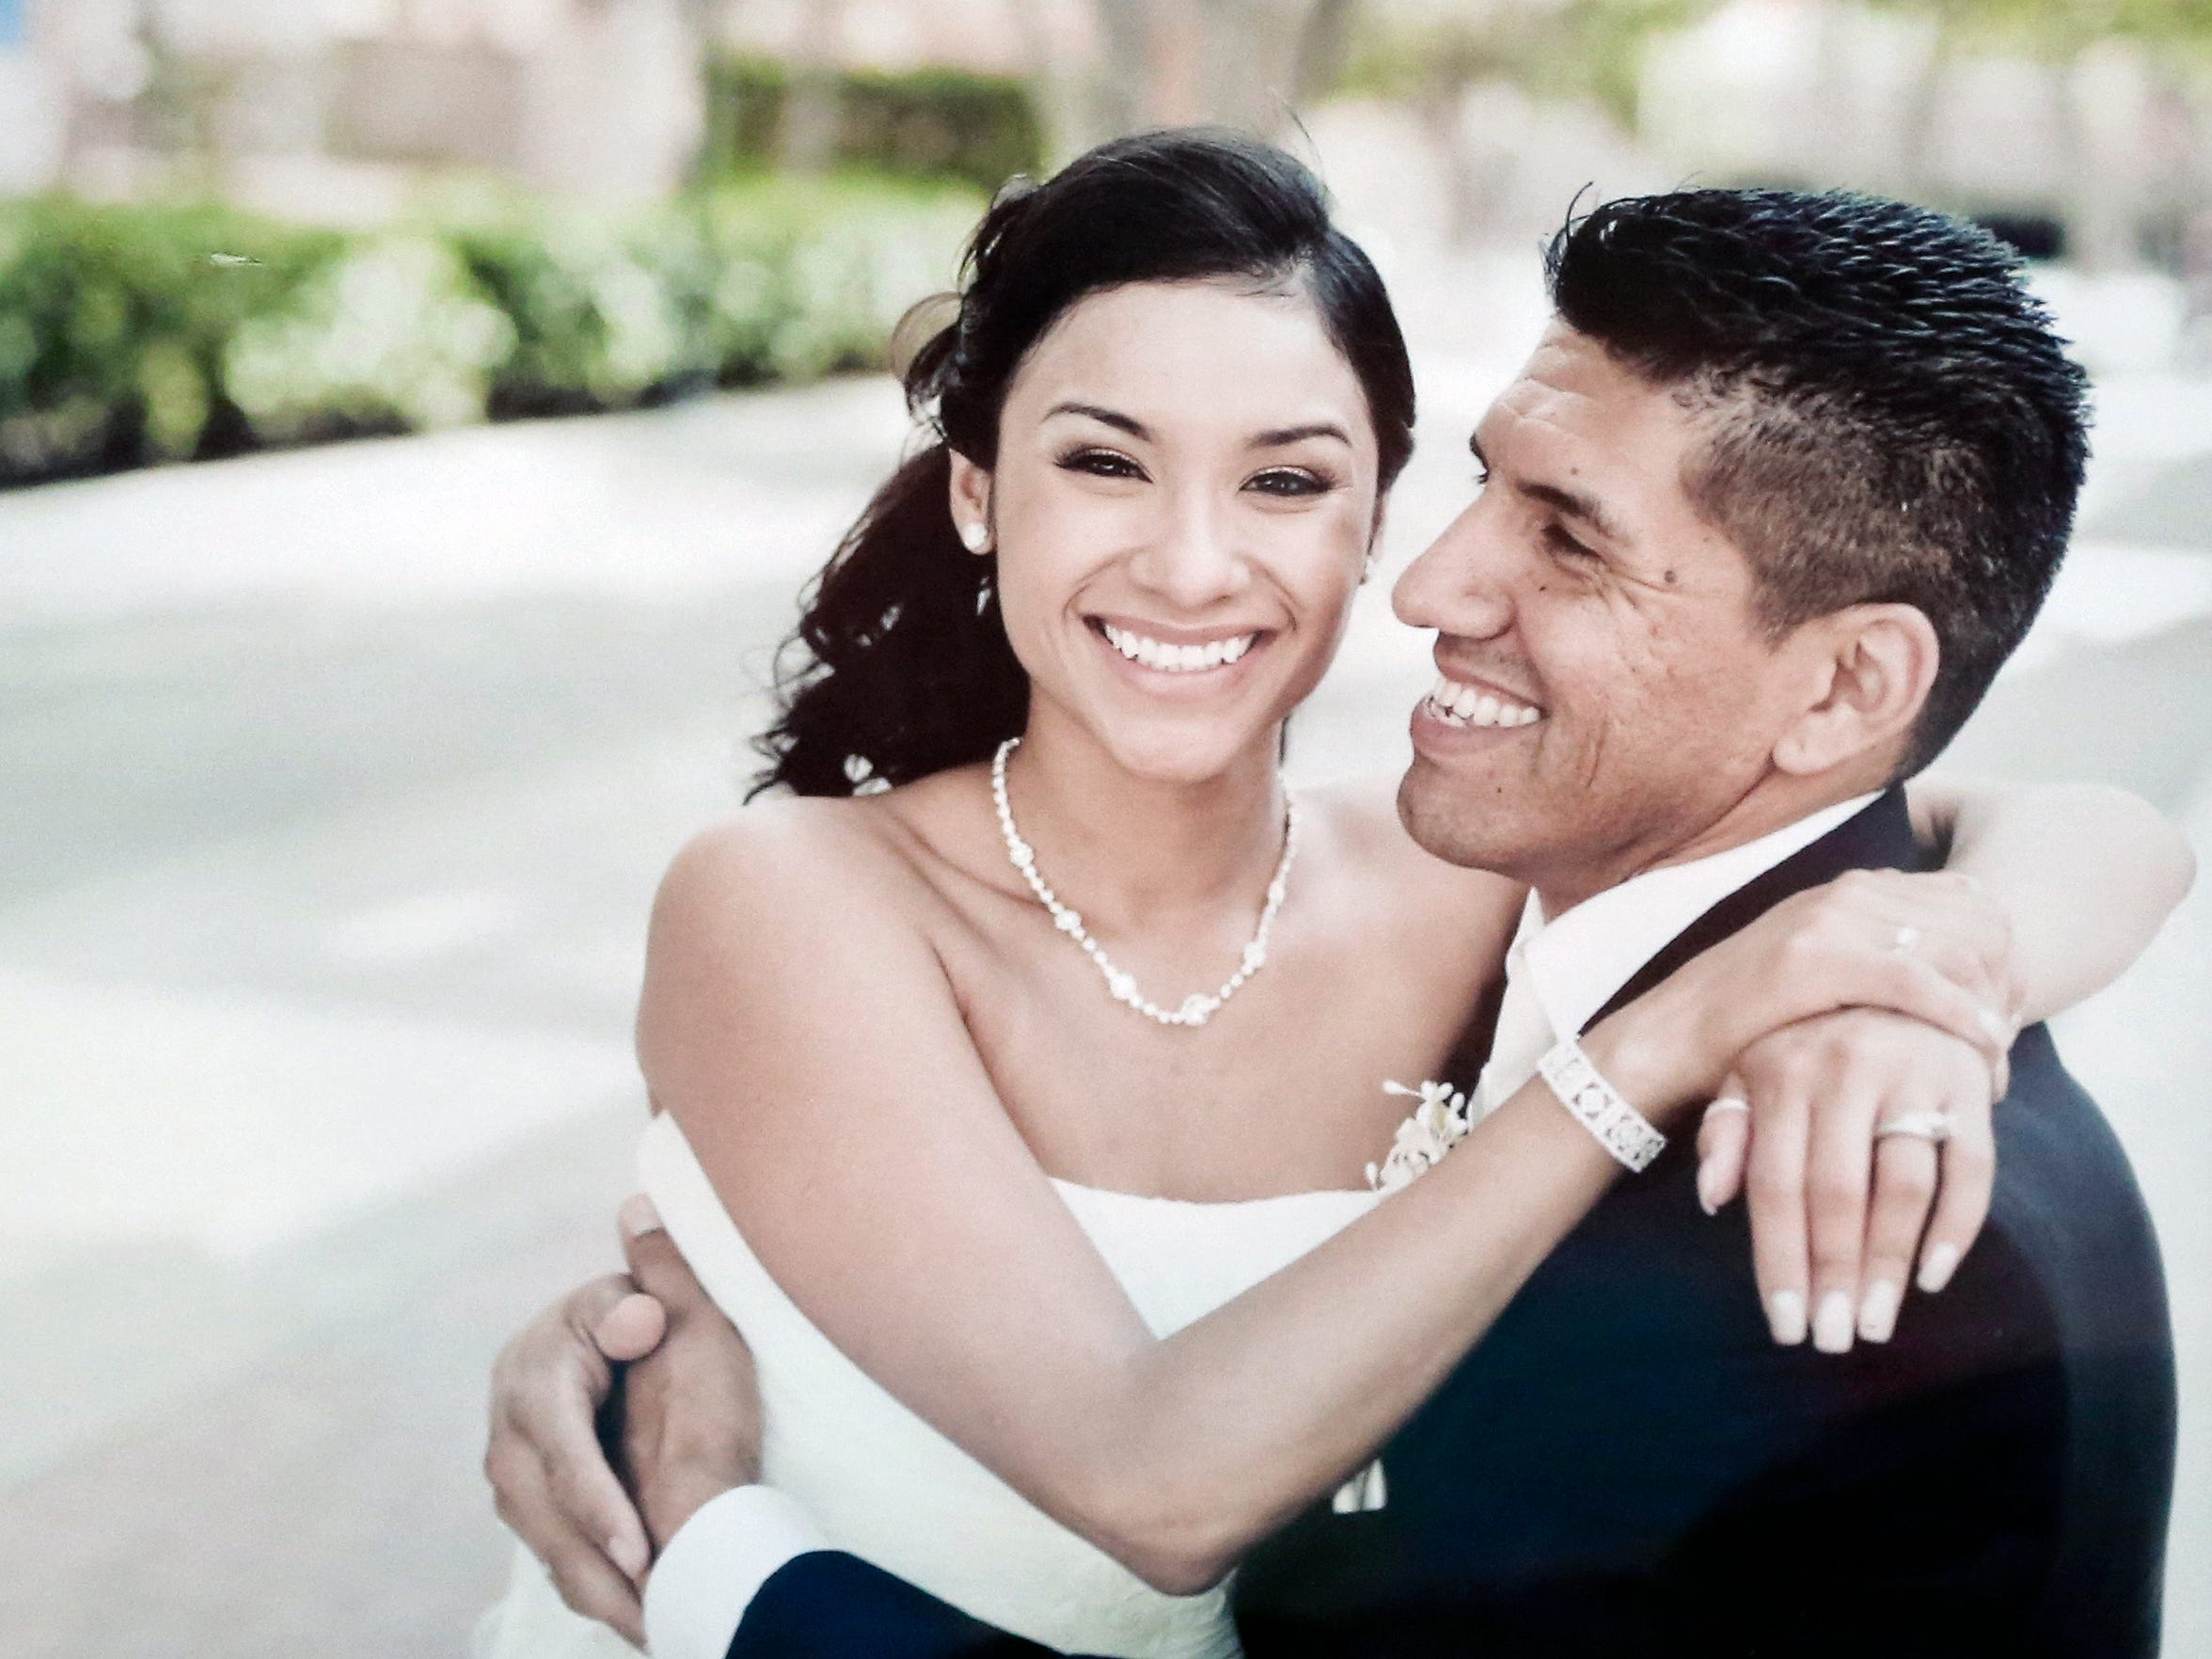 Carmen Ramirez-Salazar and Rich Salazar during their